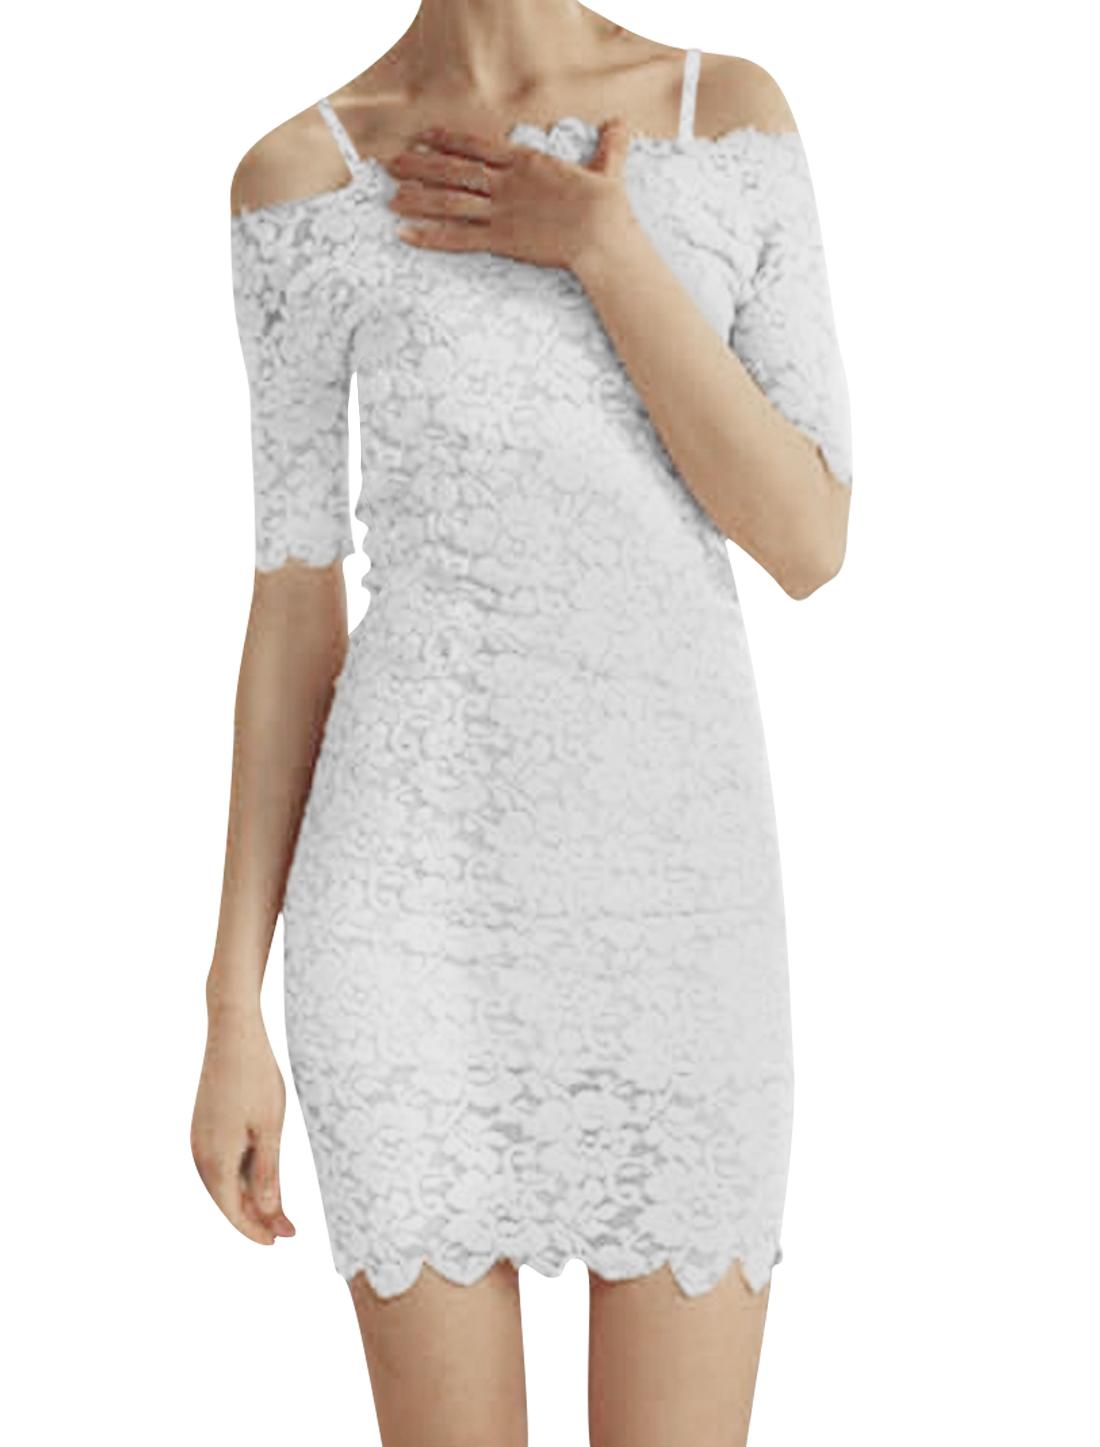 Women Stylish Off-Shoulder Elbow Sleeve Design White Mini Dress XS